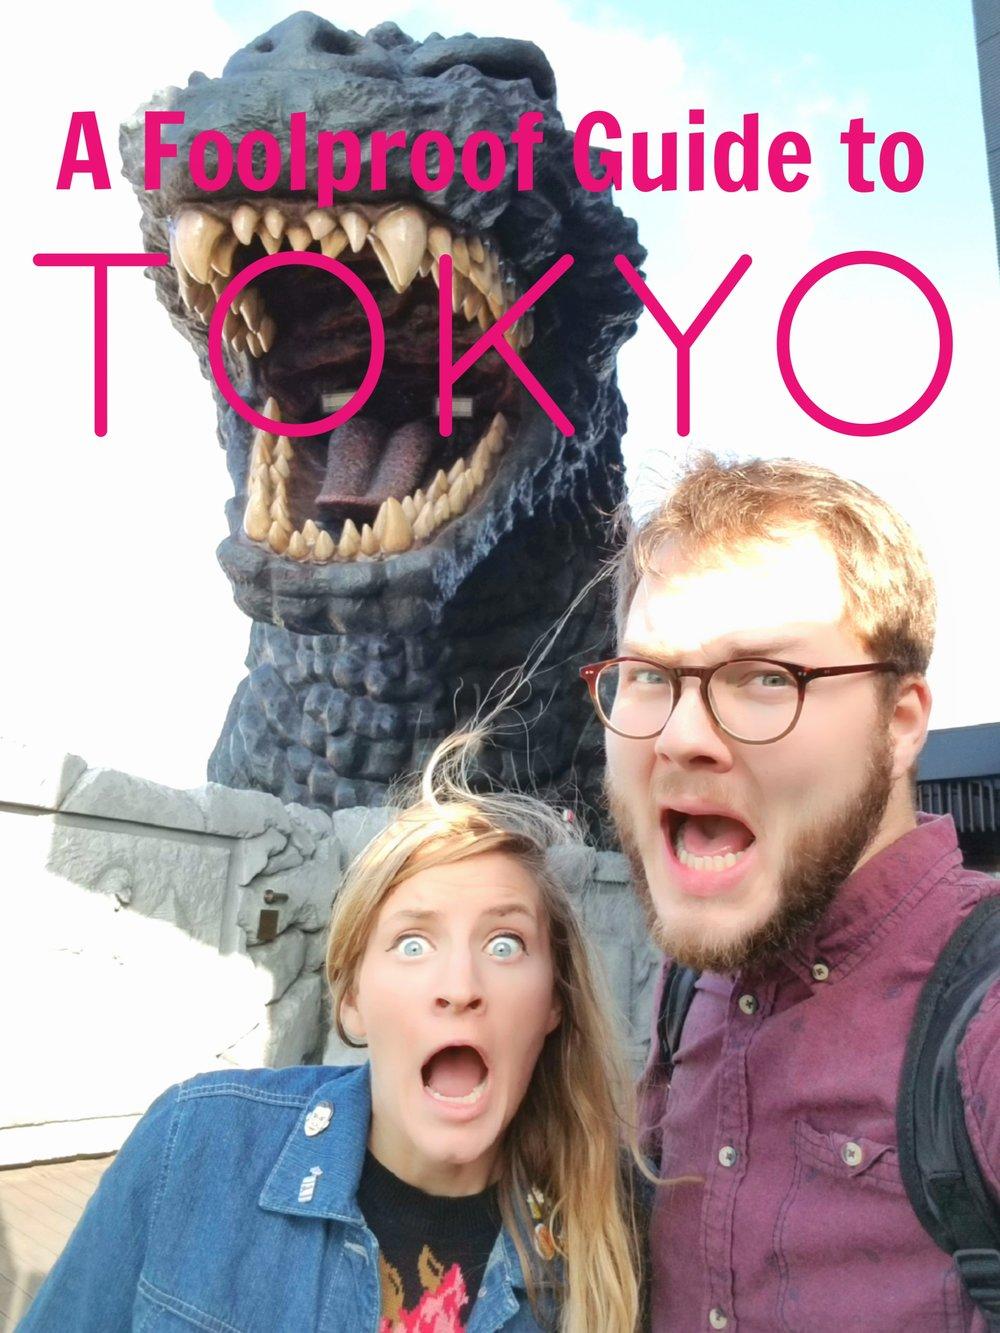 uprooted-traveler-hotel-gracery-shinjuku-foolproof-guide-to-tokyo.jpg